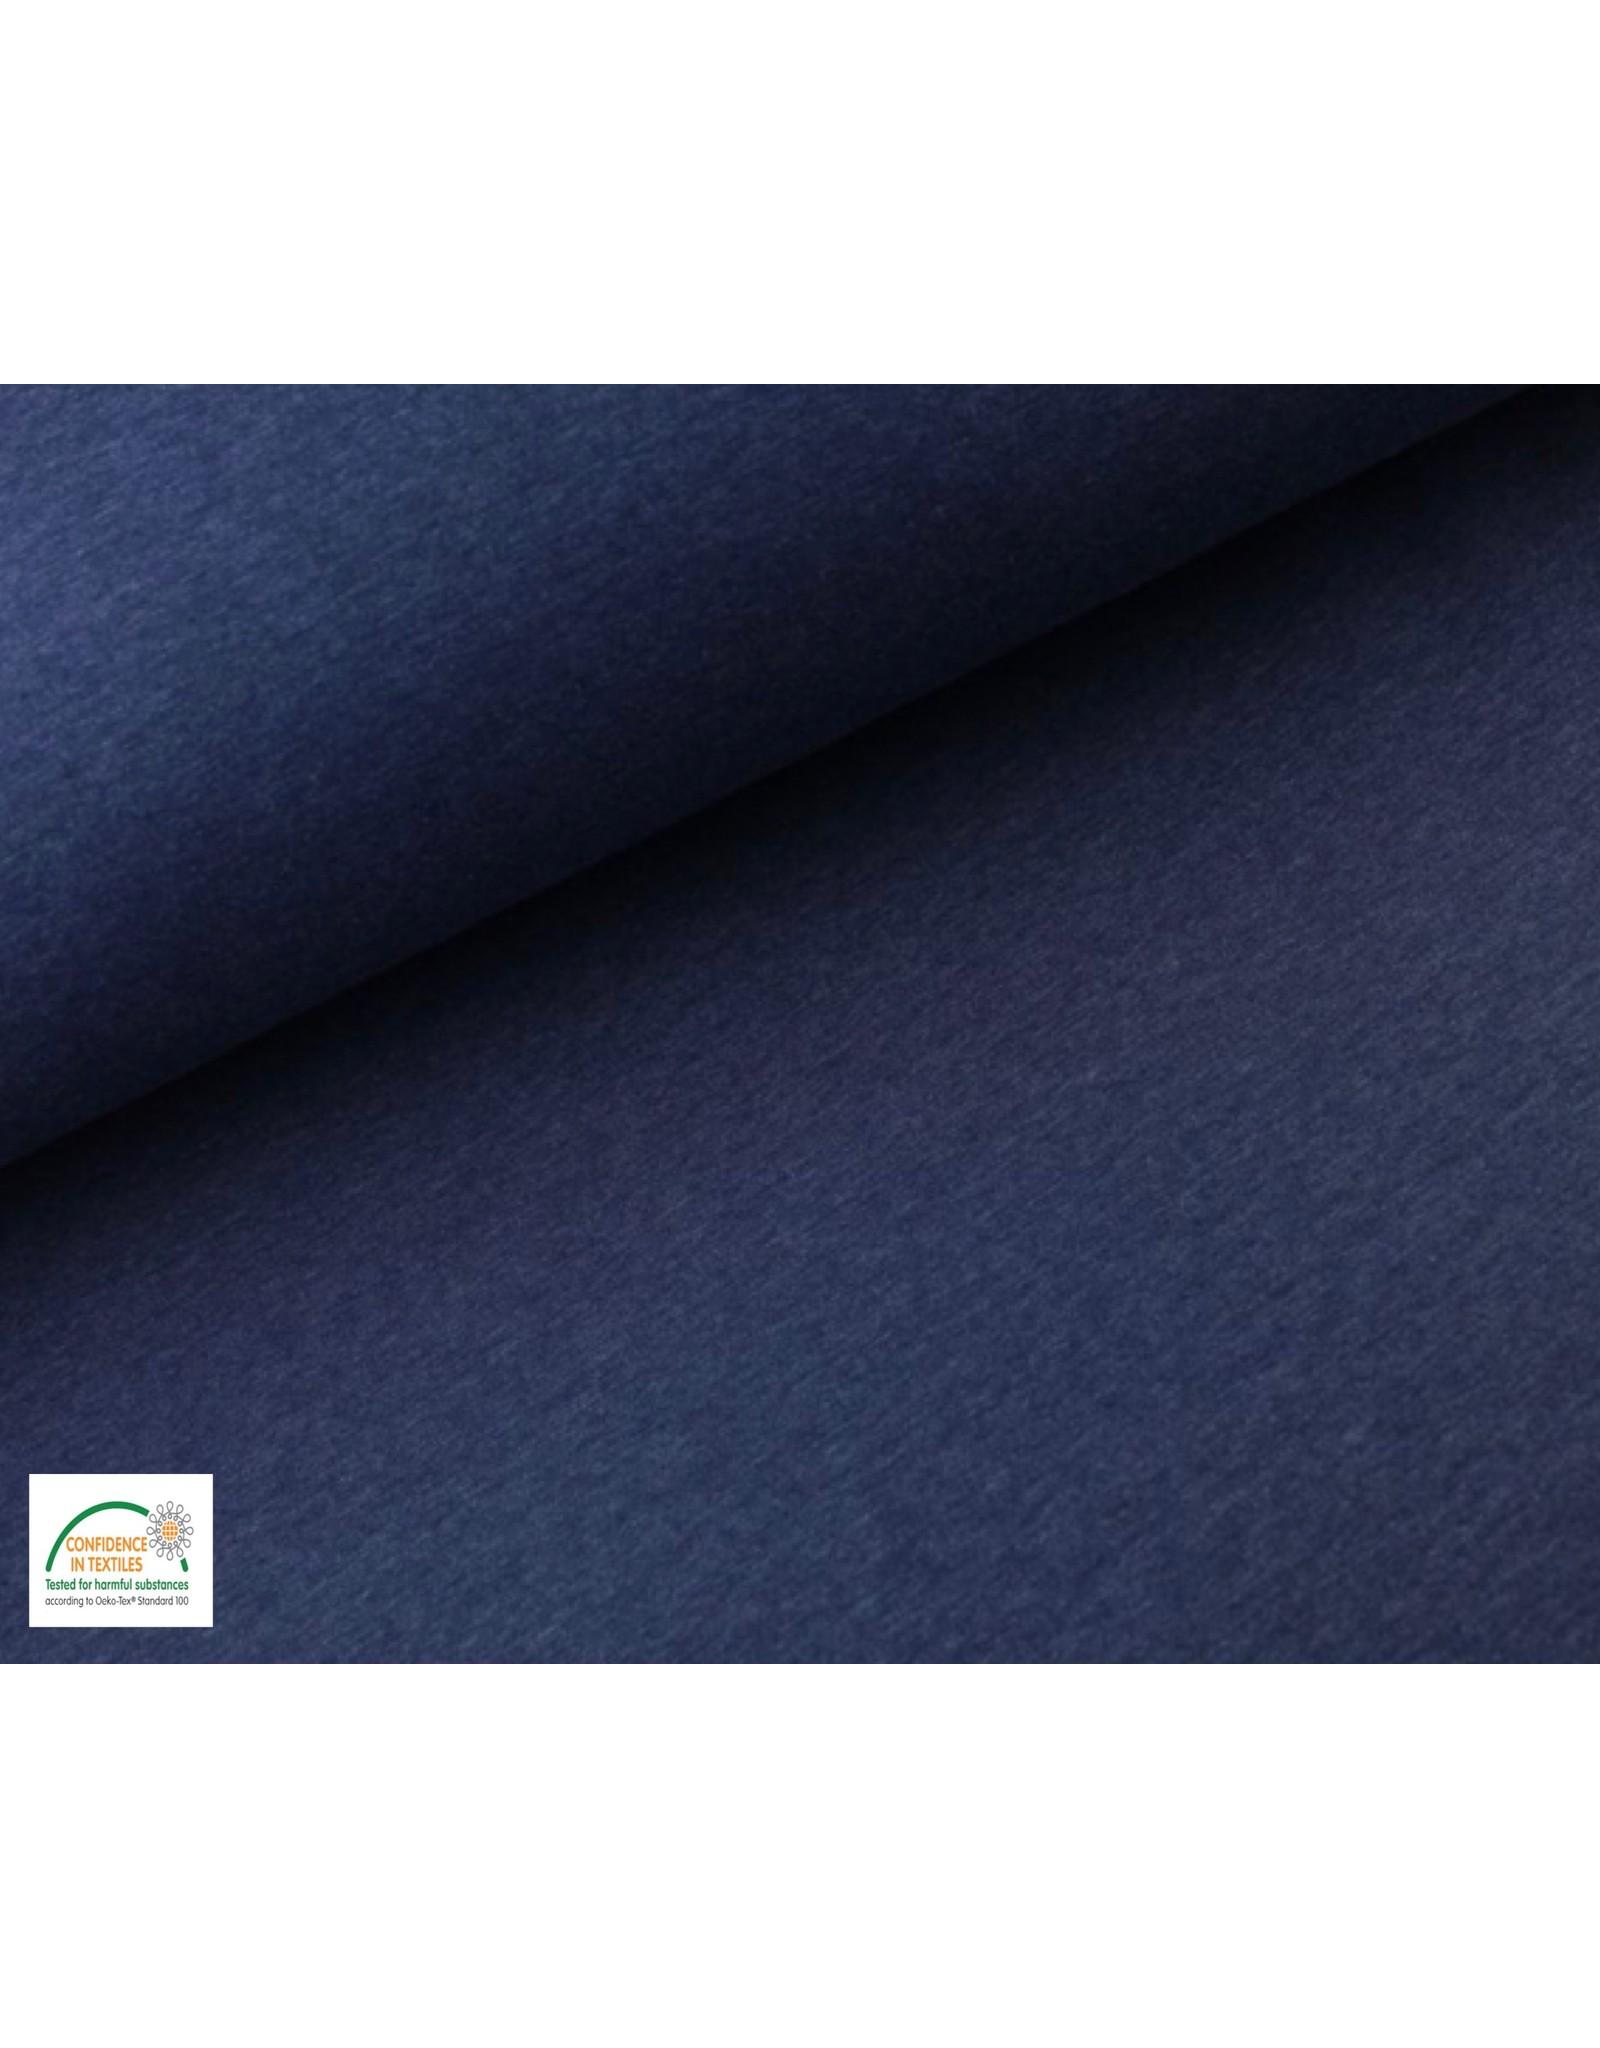 Jogging fabric - Dark Jeans Melange